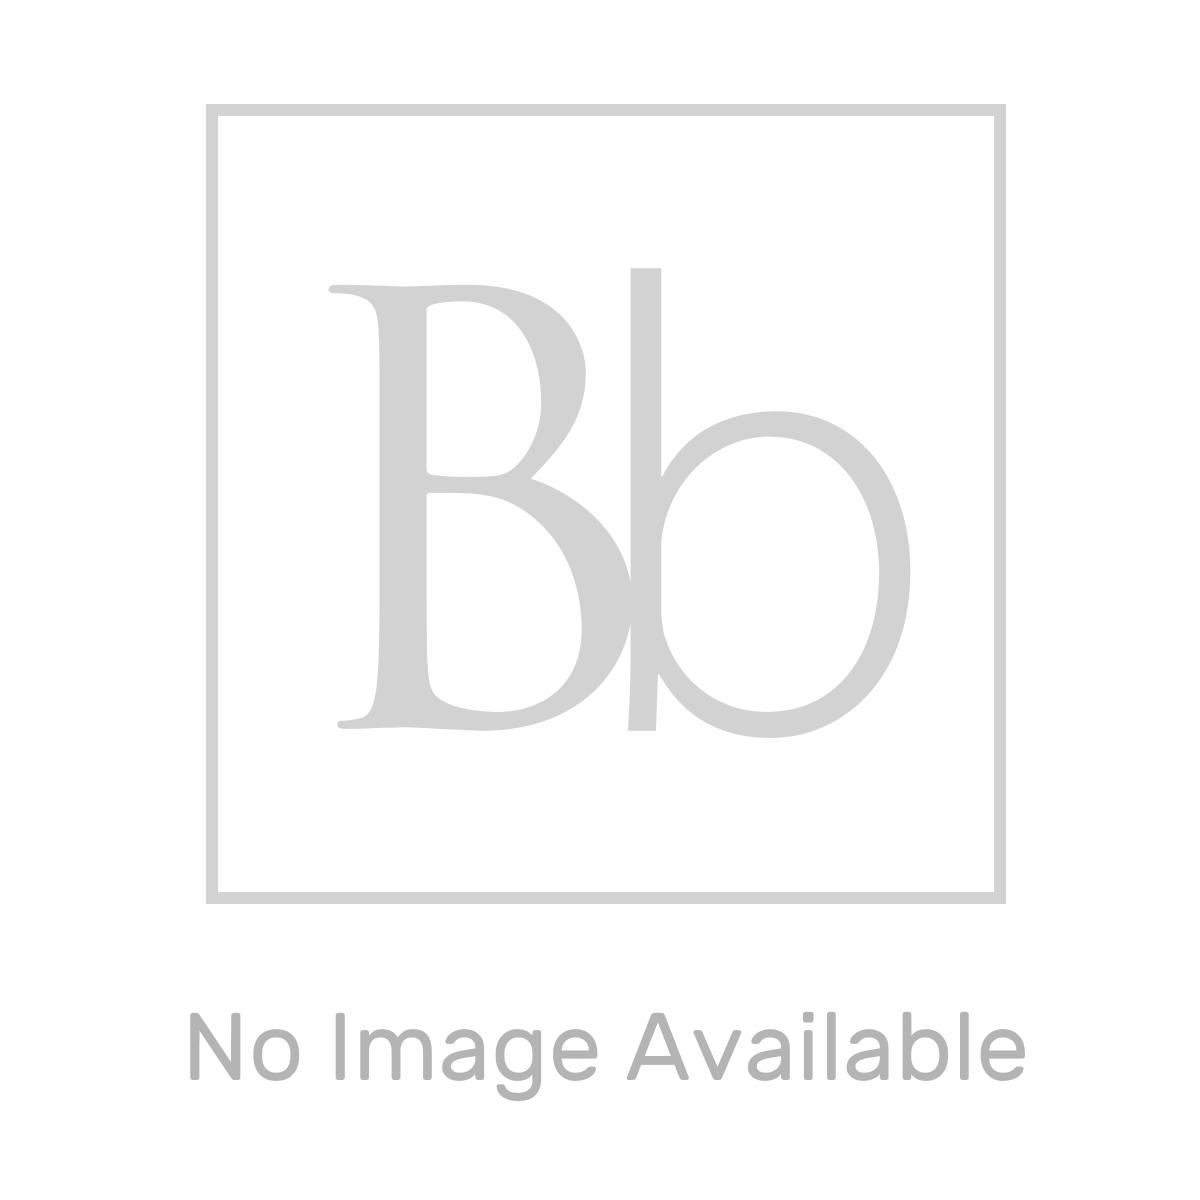 RAK Demeter Round Magnifying Mirror With Light Line Drawing